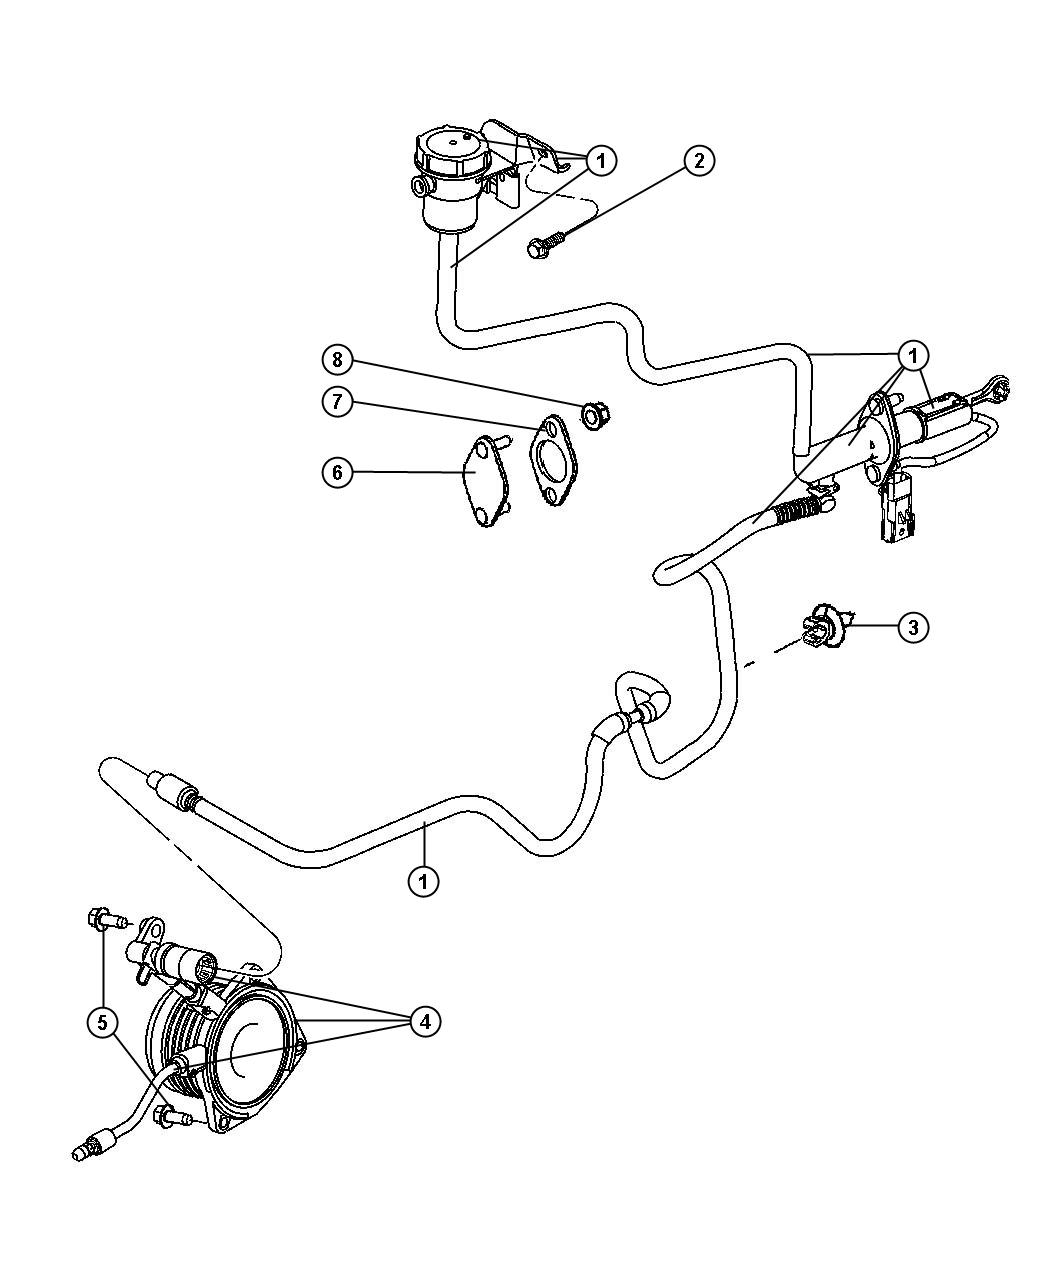 Chrysler Linkage, Clutch / LHD.